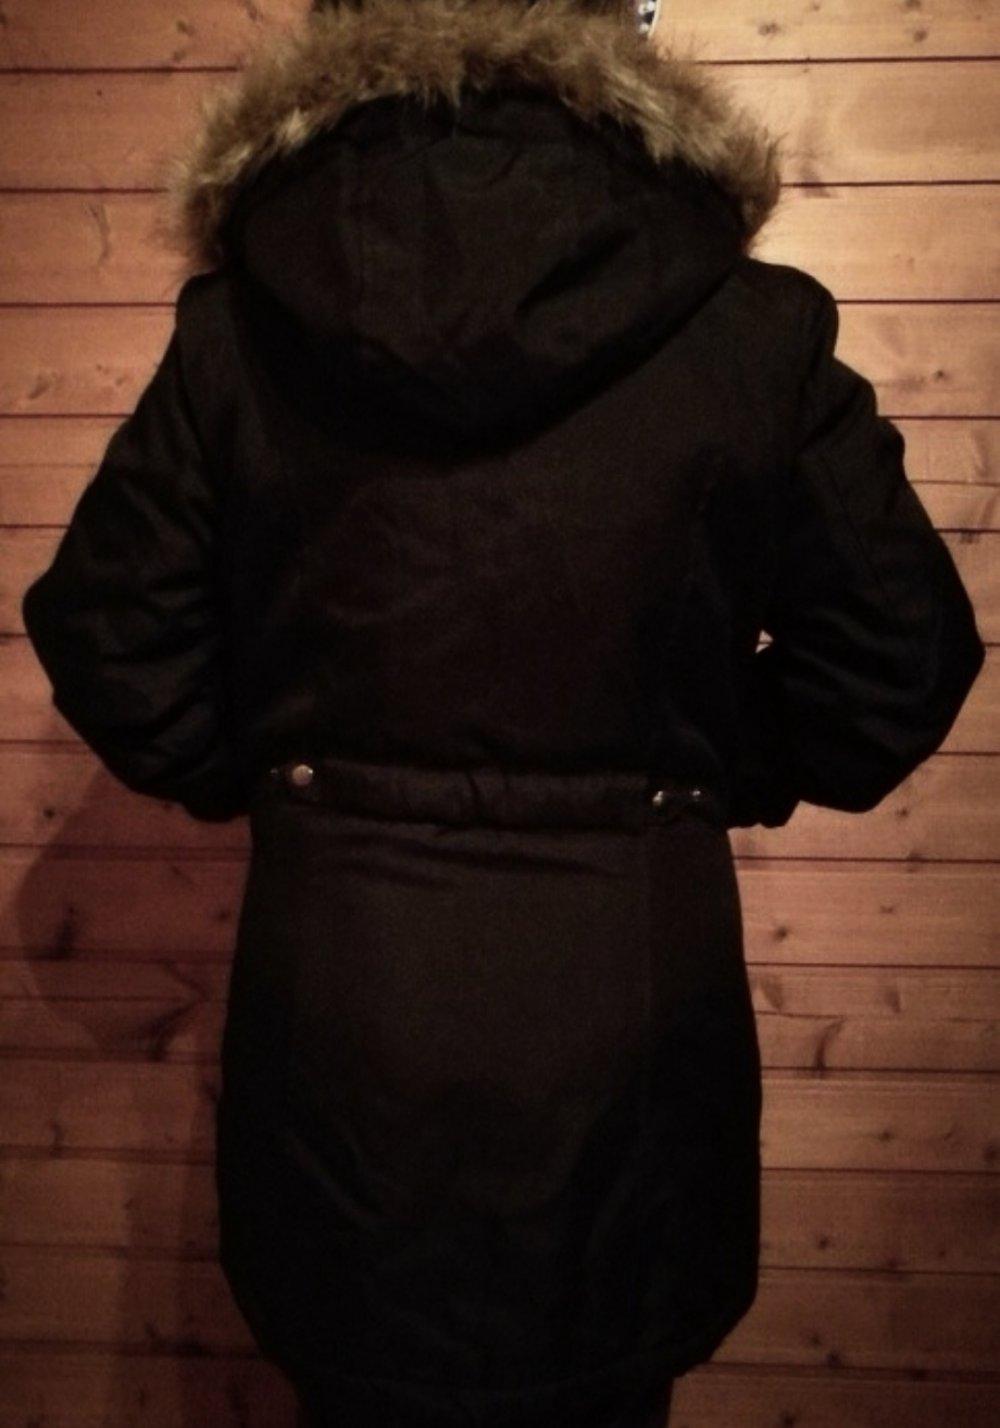 b170f410b065 Vero Moda Parka Winterjacke Gr. L    Kleiderkorb.de